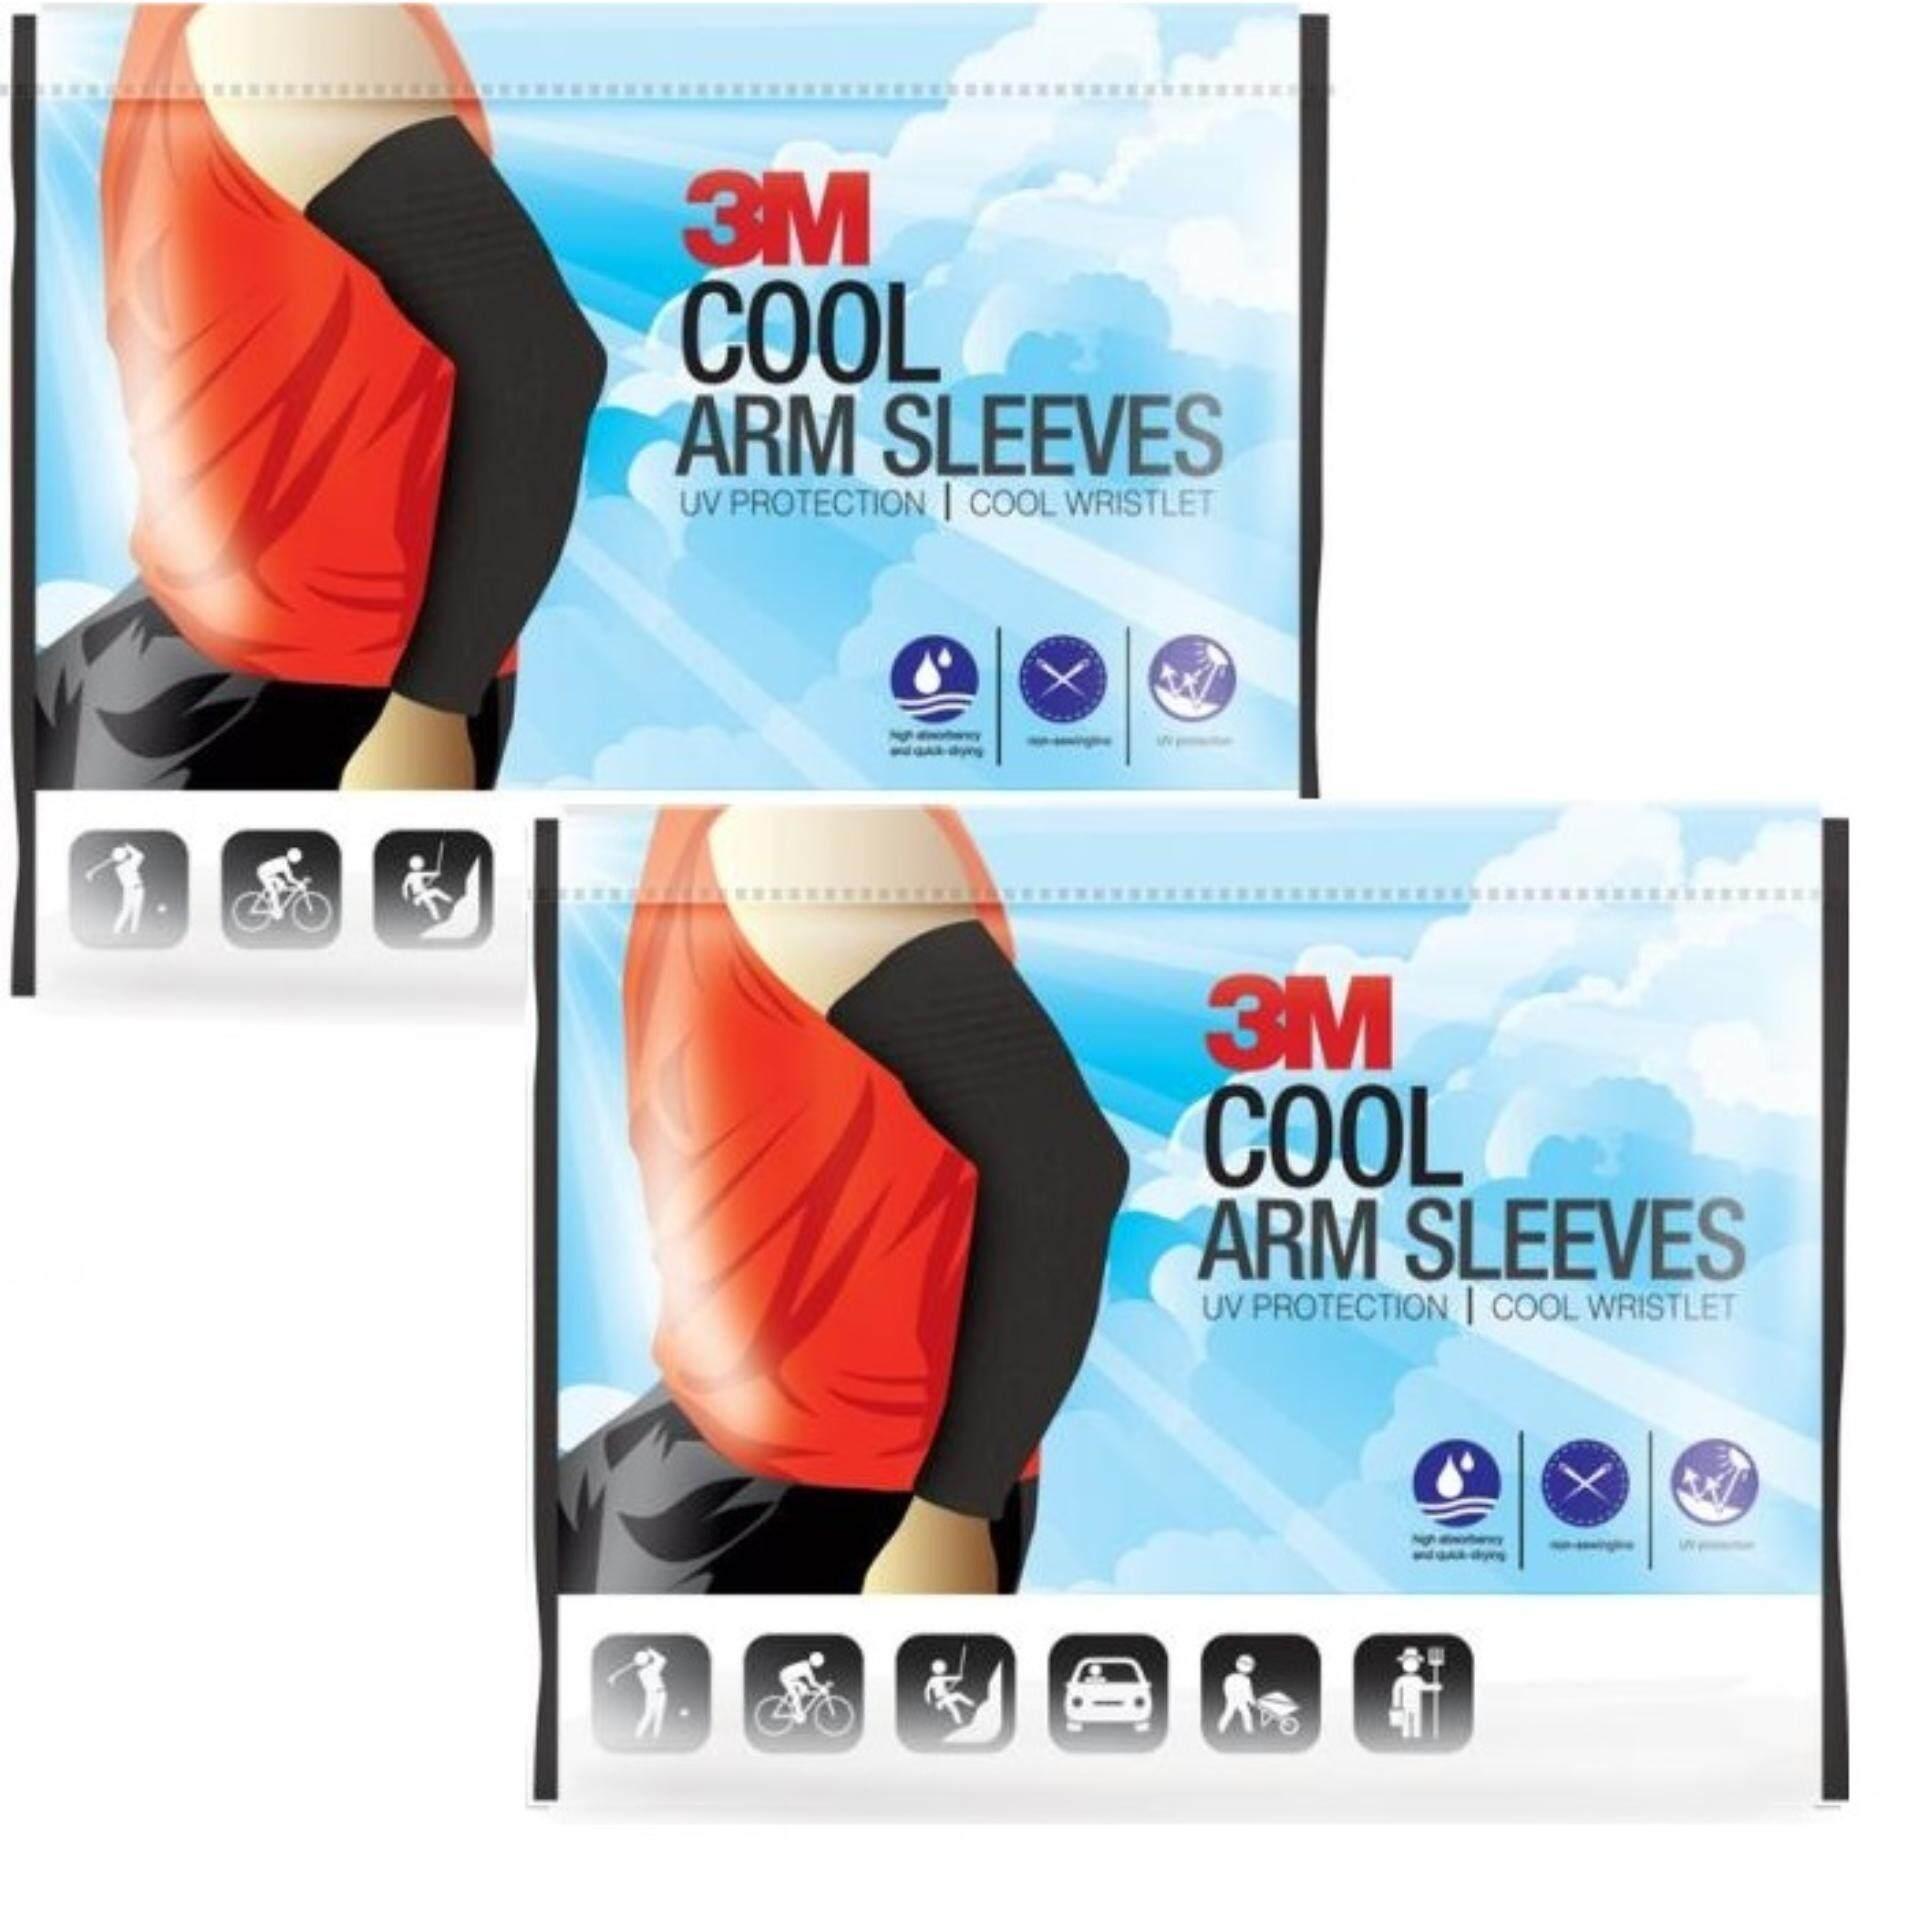 3M (x2 คู่) ปลอกแขนป้องกันรังสี UV99% สำหรับนักปั่นจักรยาน UV Protection Cool Arm Sleeves